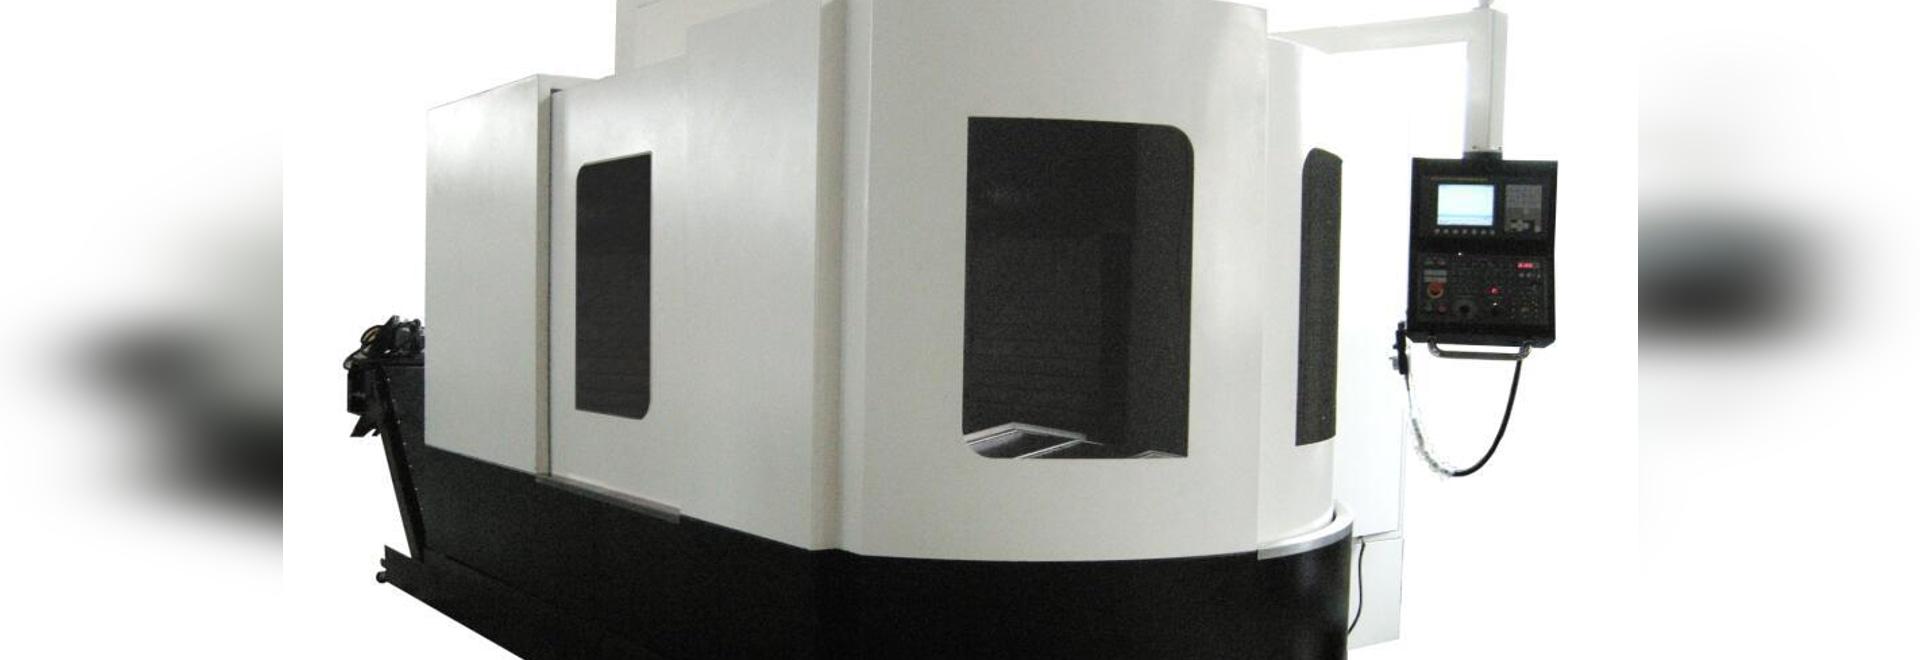 Mitsubishi or Fanuc CNC system Horizontal CNC Milling